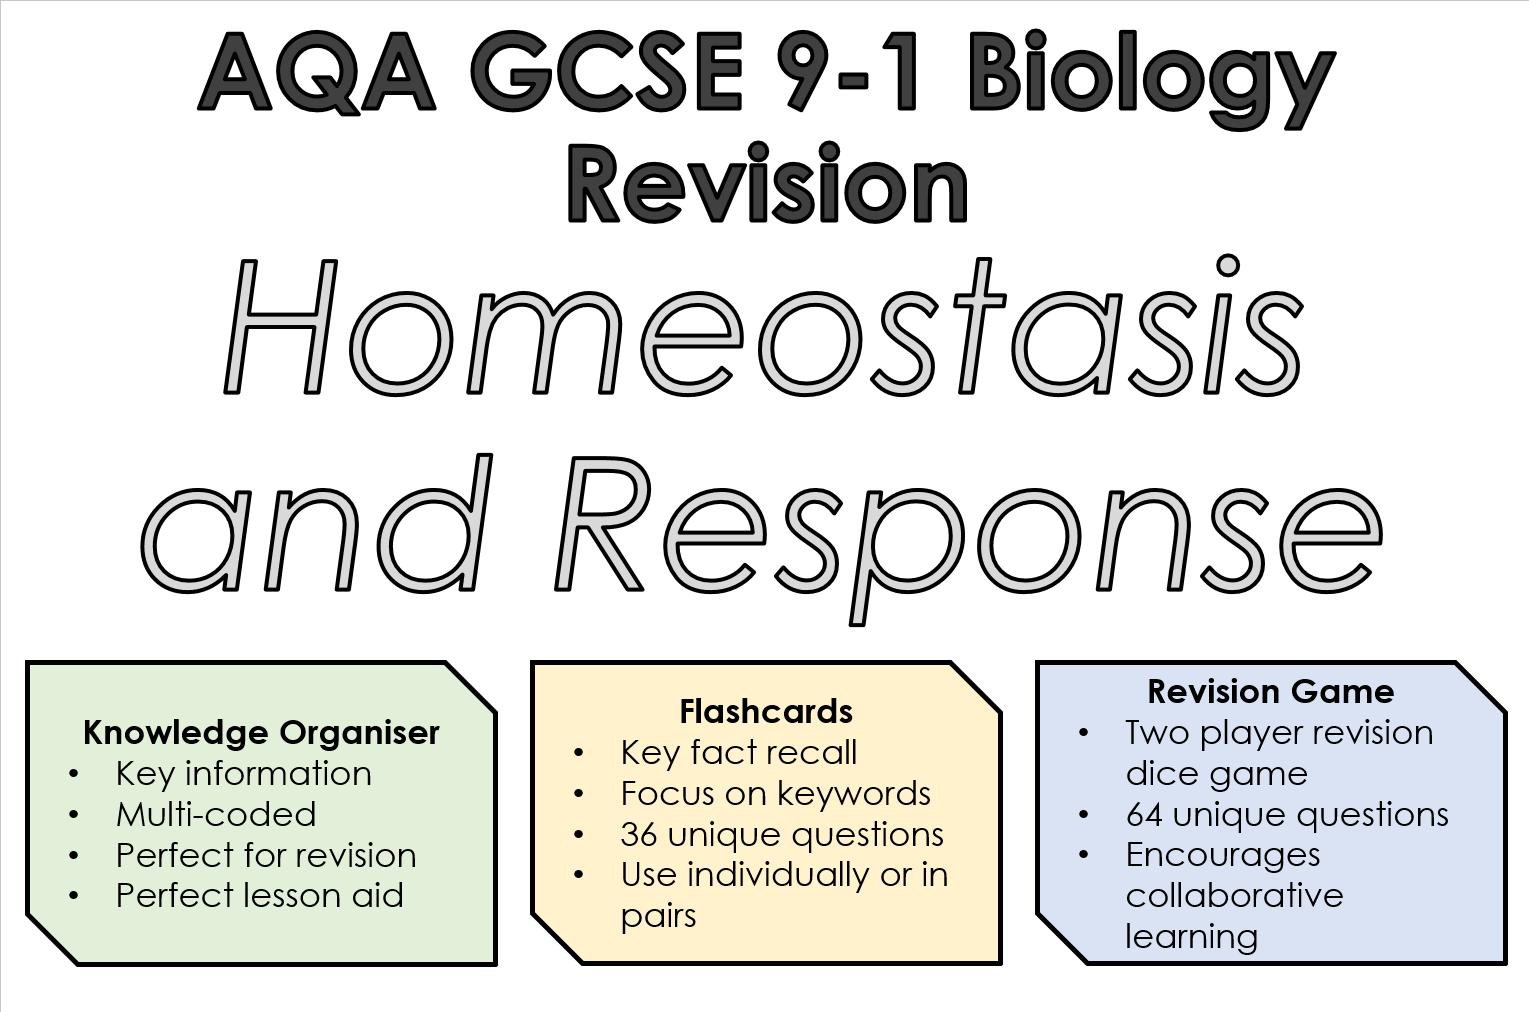 Aqa 9 1 Gcse Biology Homeostasis And Response Revision